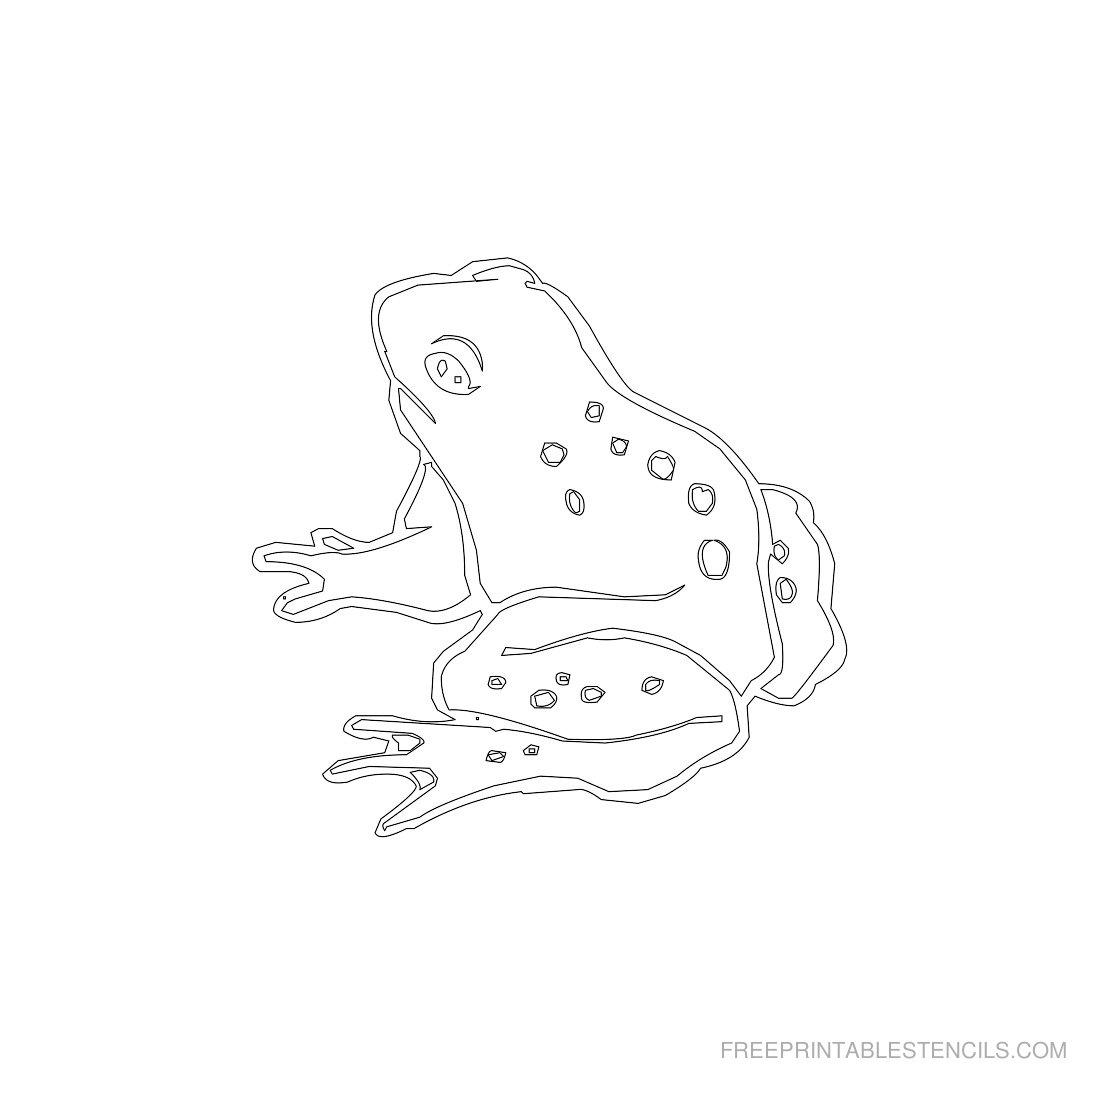 Free Printable Animal Stencil Frog